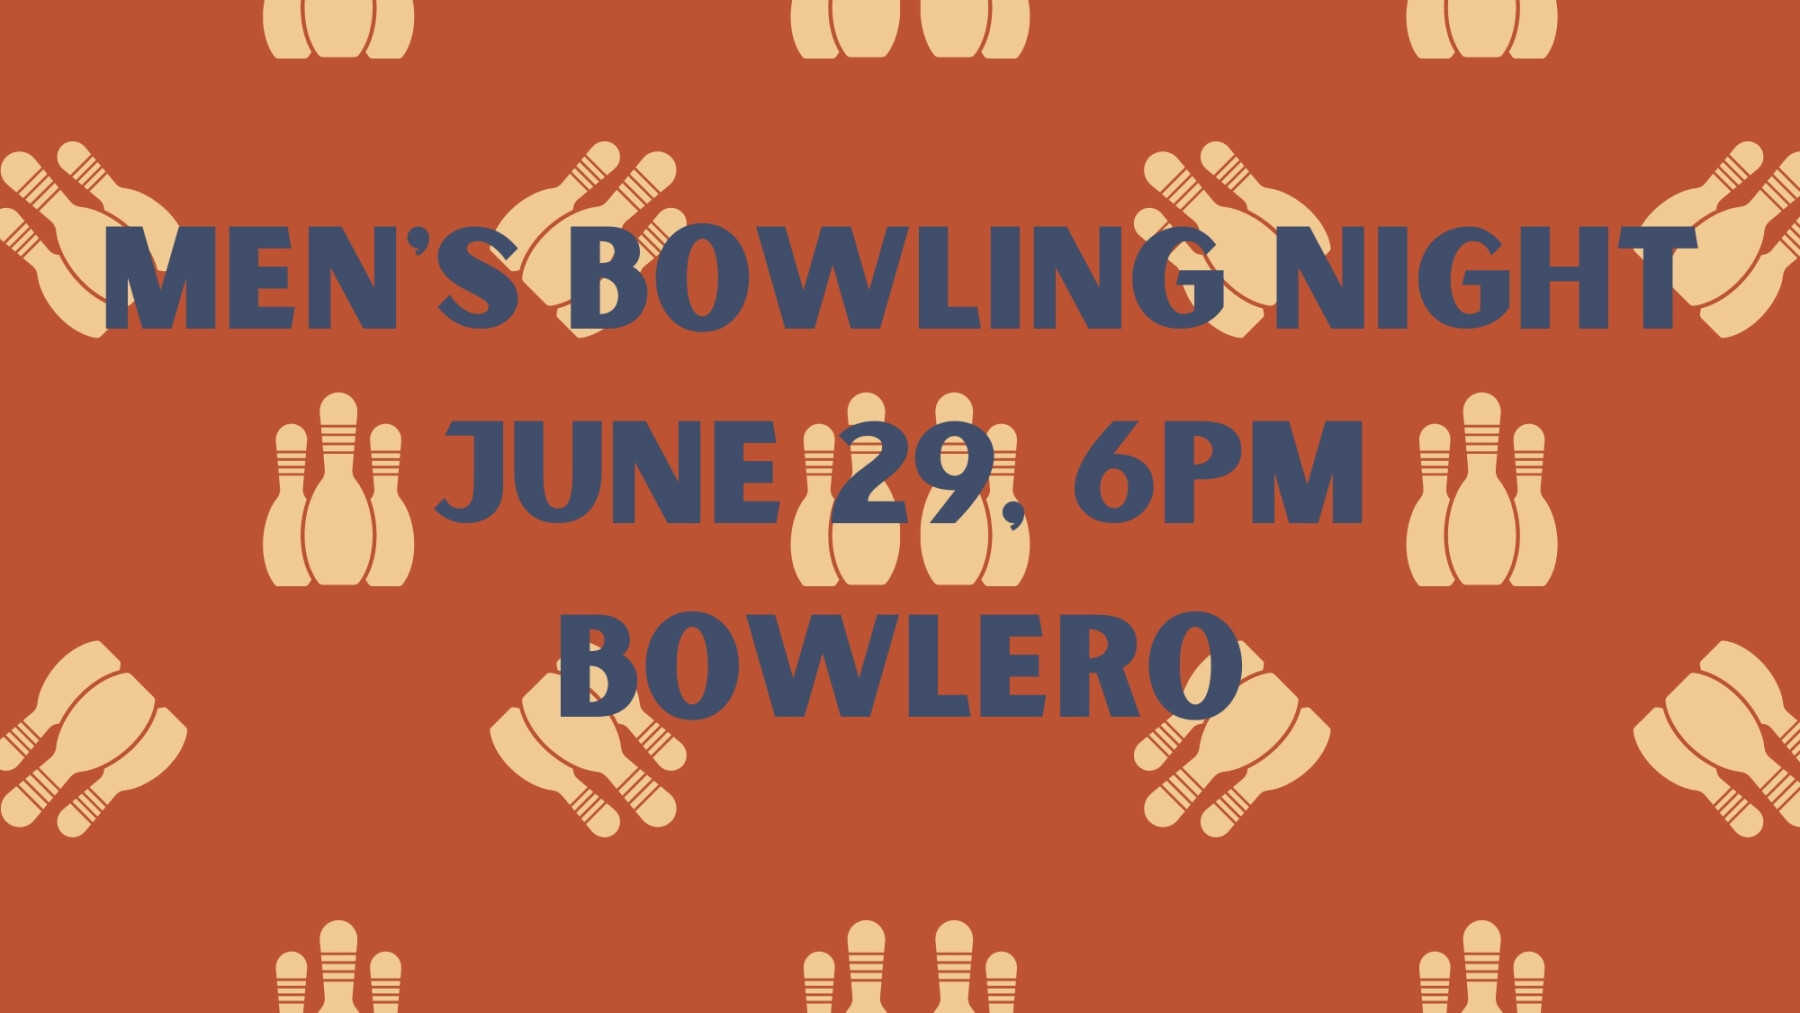 Men's Bowling Tuesday